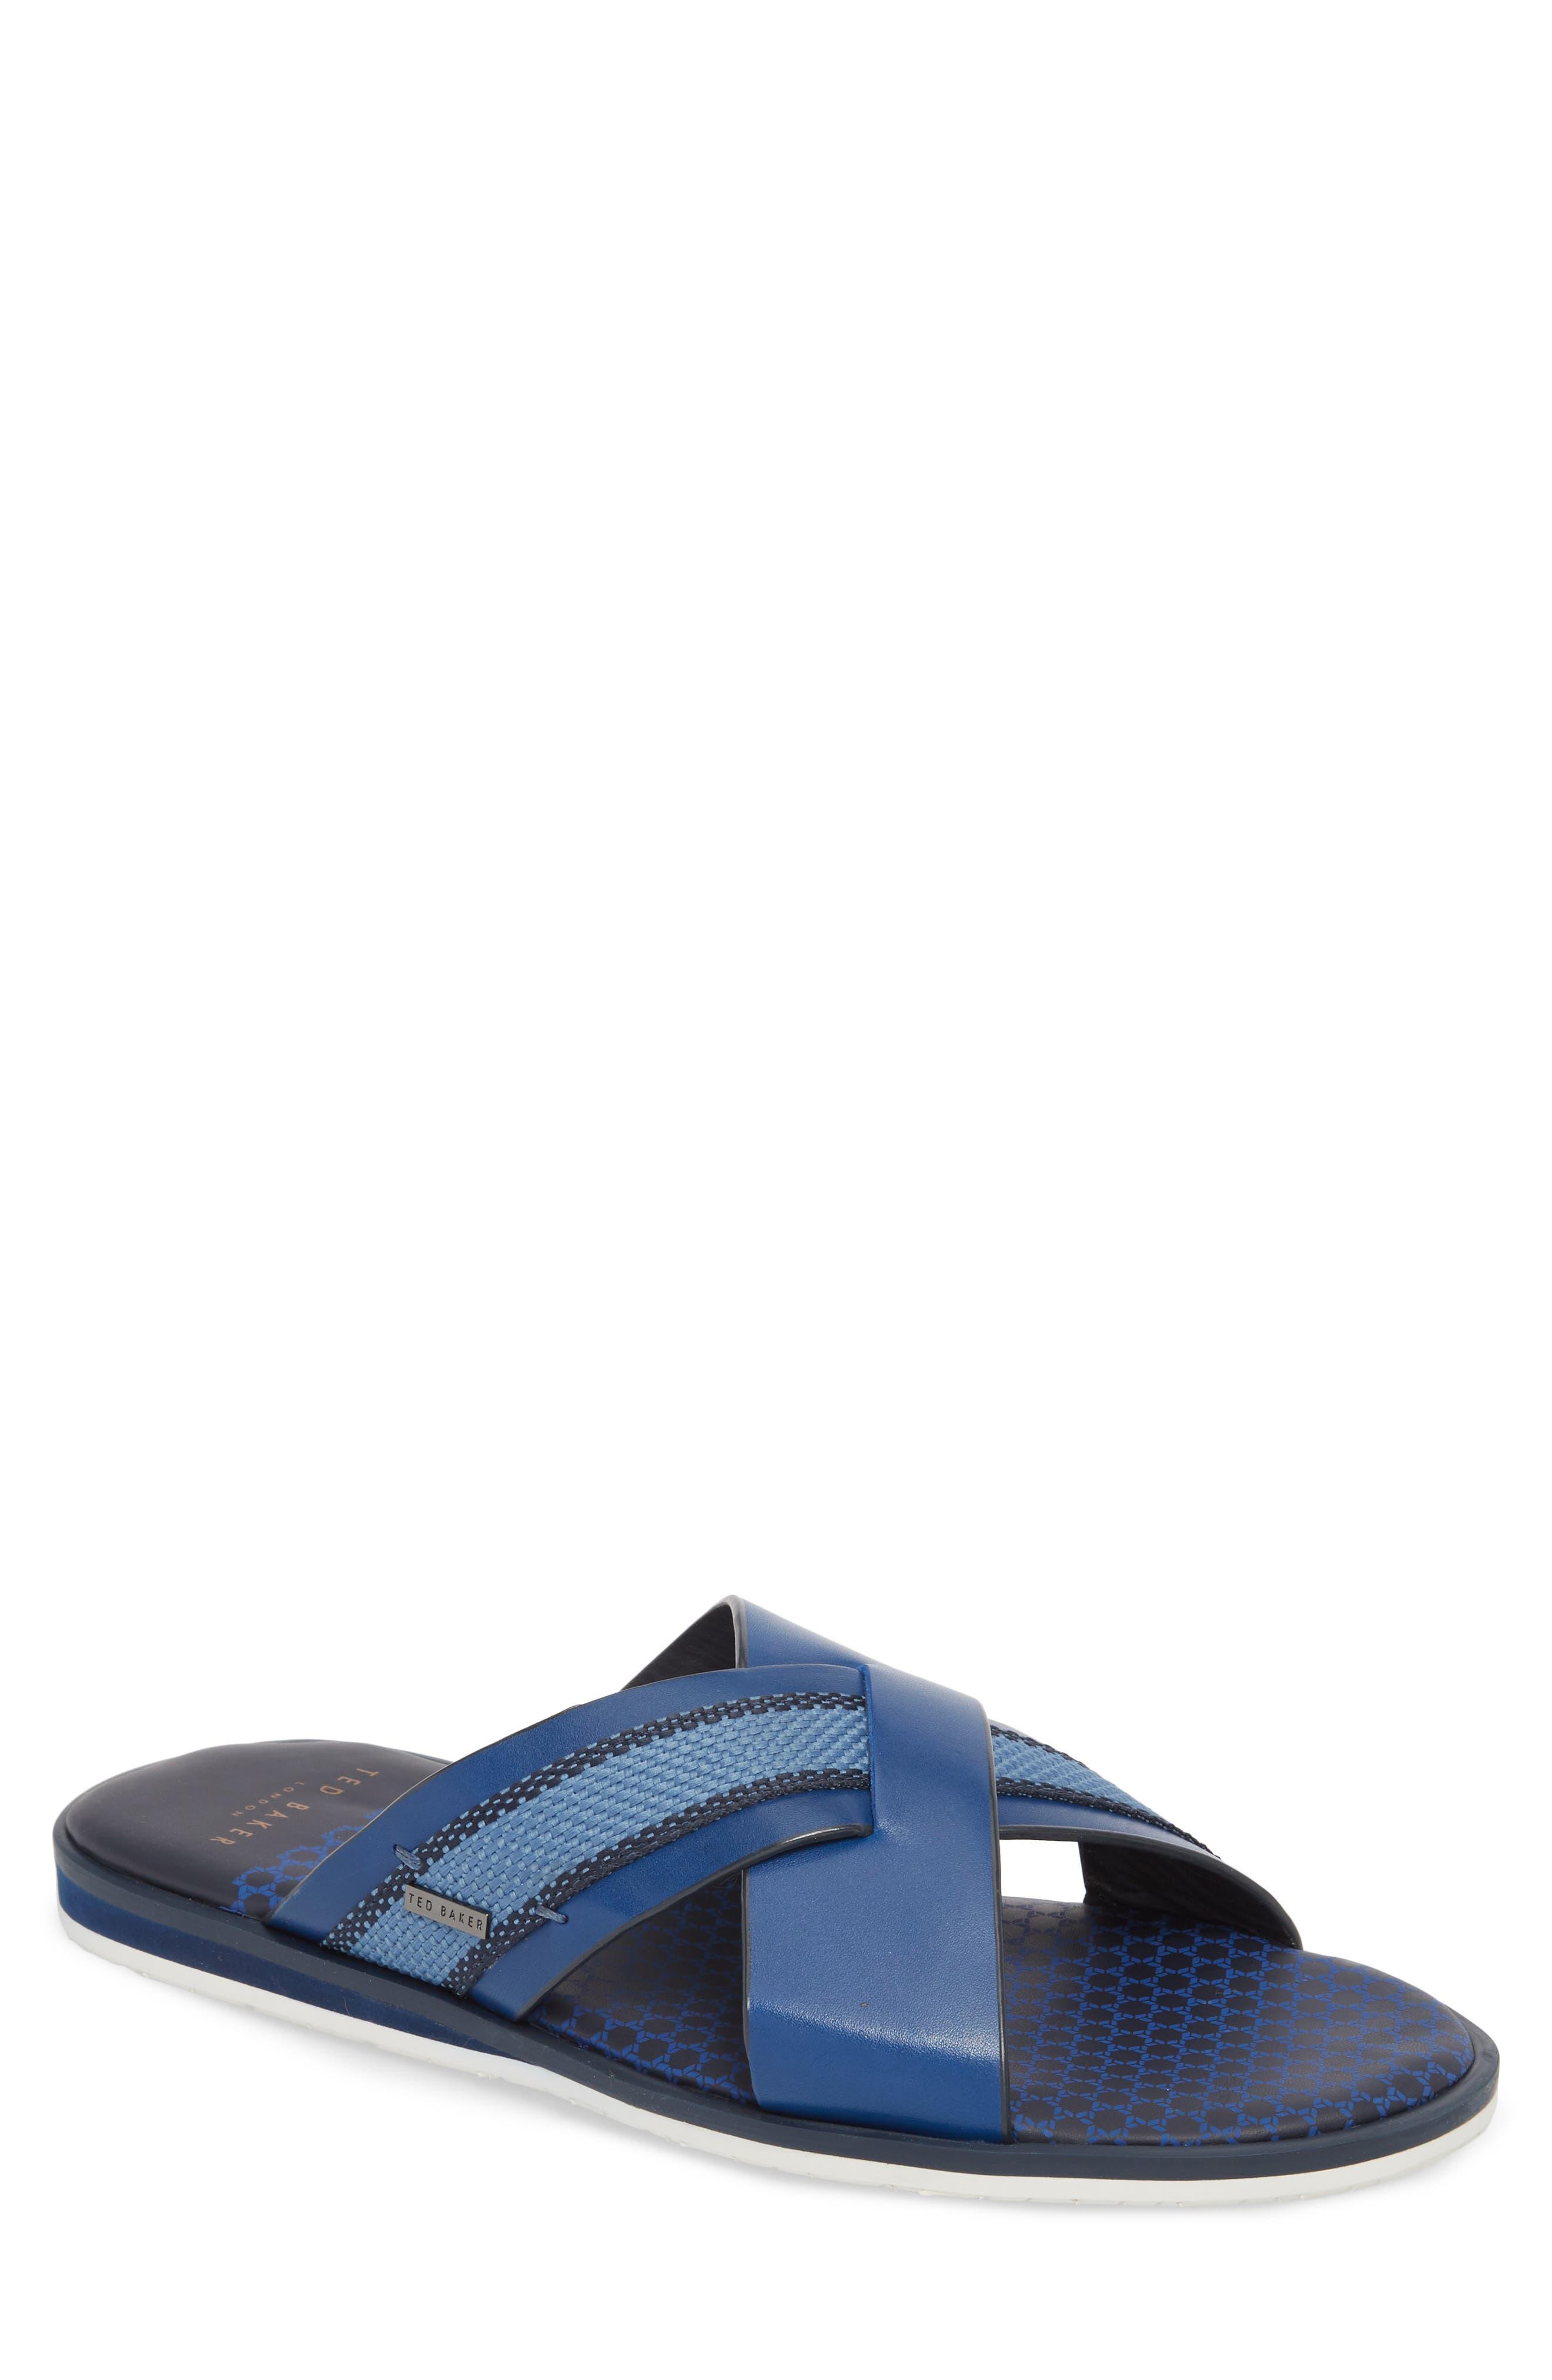 Farrull Cross Strap Slide Sandal,                         Main,                         color, BLUE LEATHER/TEXTILE